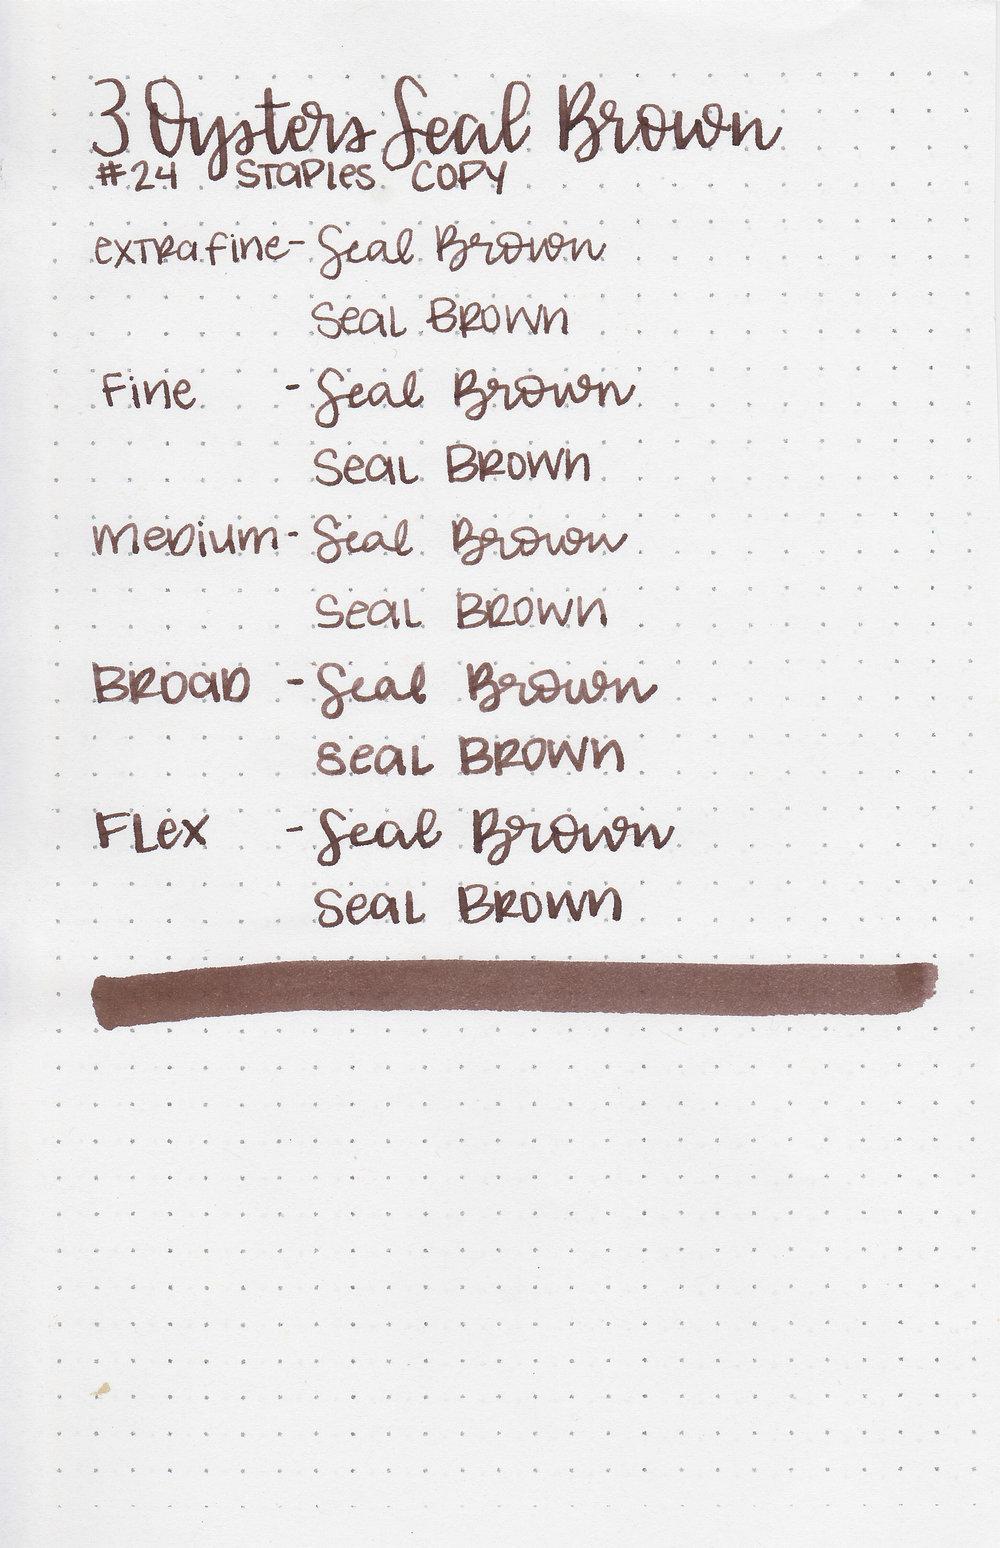 3o-seal-brown-9.jpg